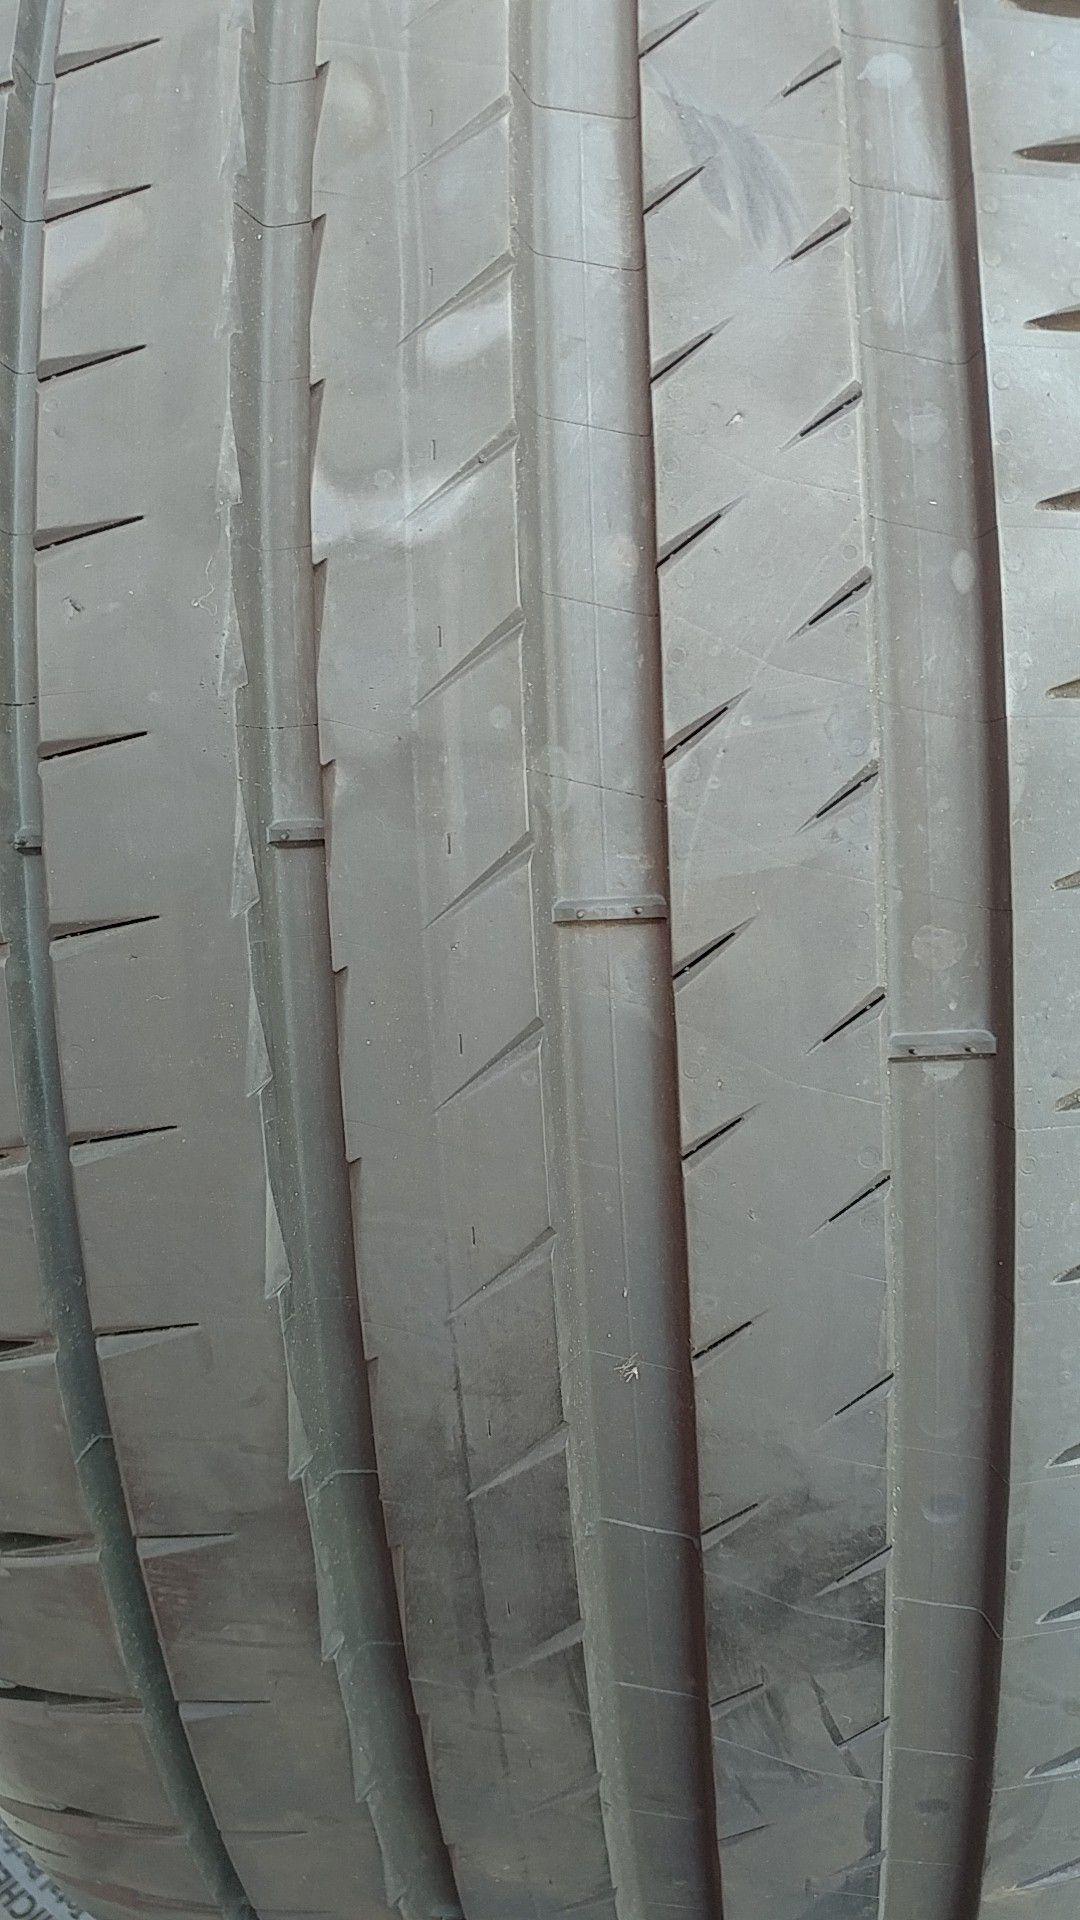 255 40 20 set of 4 Michelin pilot sport